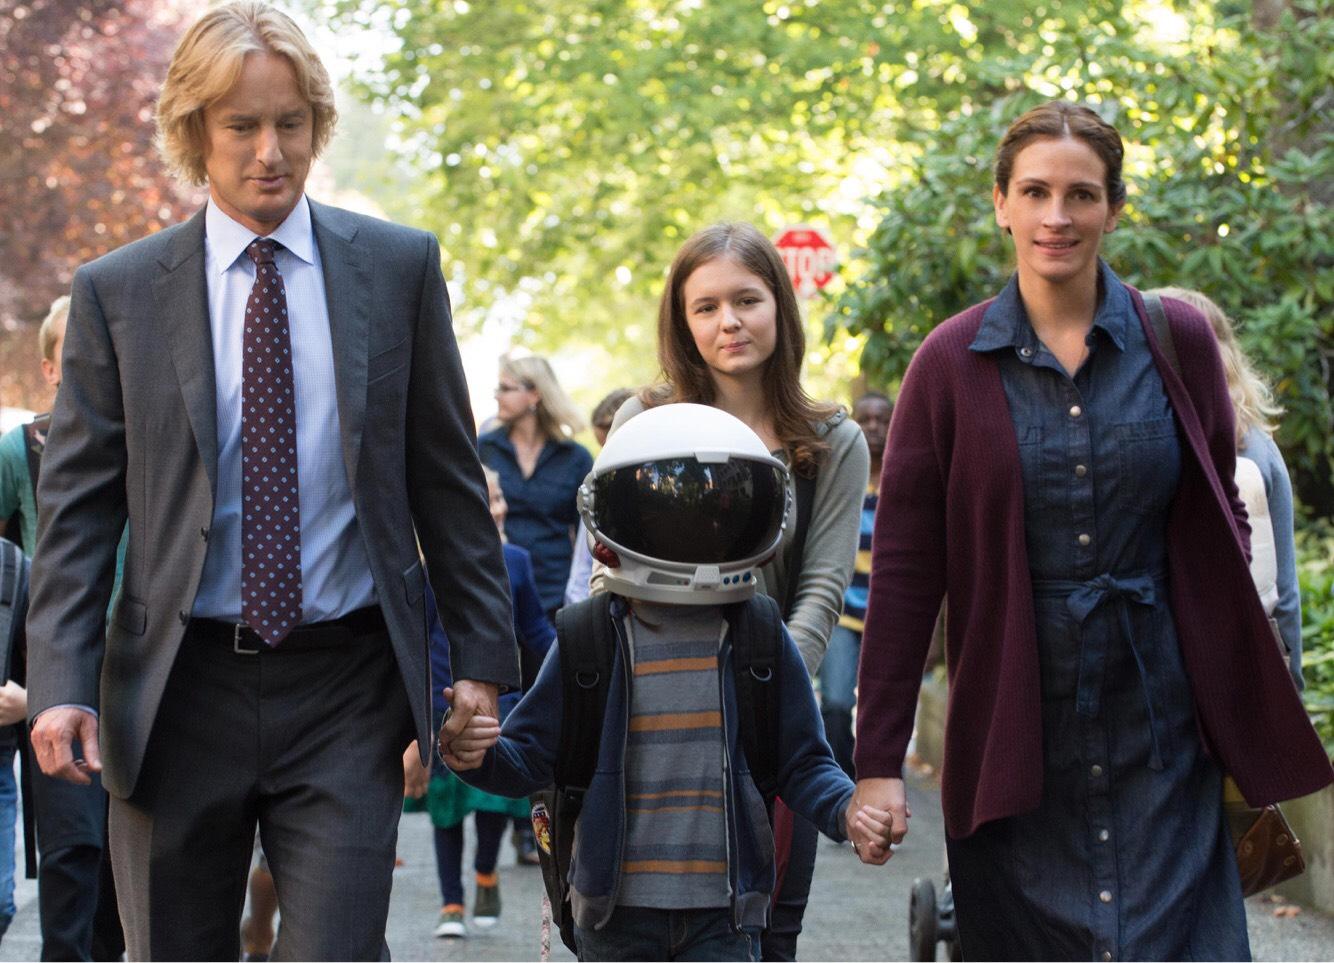 Auggie (Jacob Trembley) berjalan menunu sekolah barunya bersama kedua orang tua dan kakaknya.